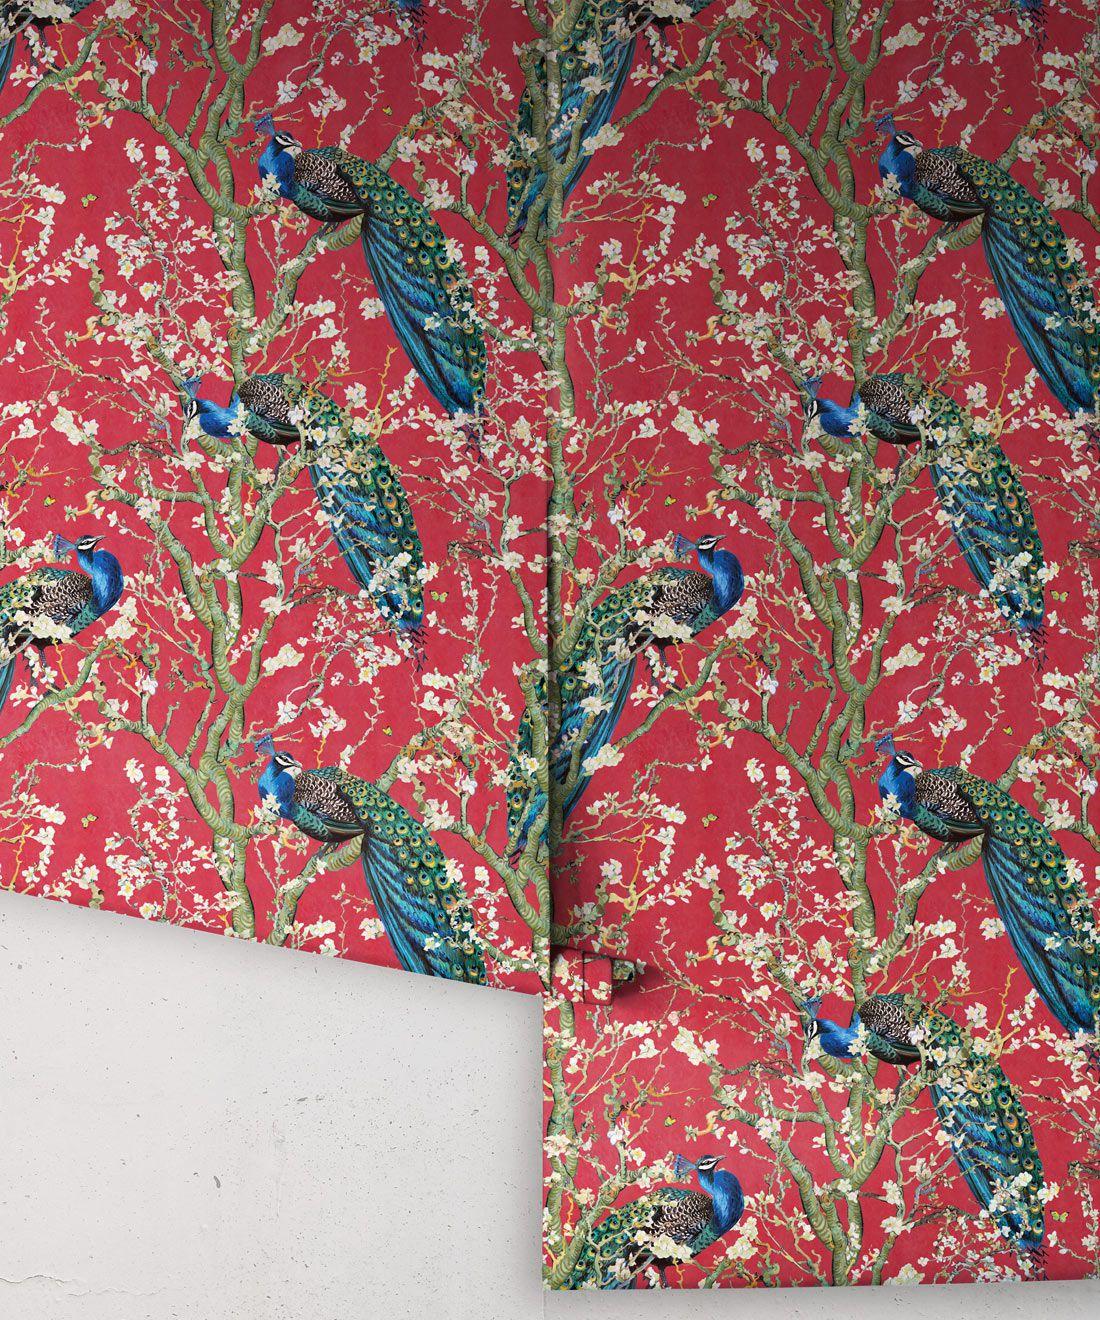 Almond Blossom Wallpaper • Chinoiserie Wallpaper • Wallpaper with Peacocks • Red Lantern Wallpaper •Rolls